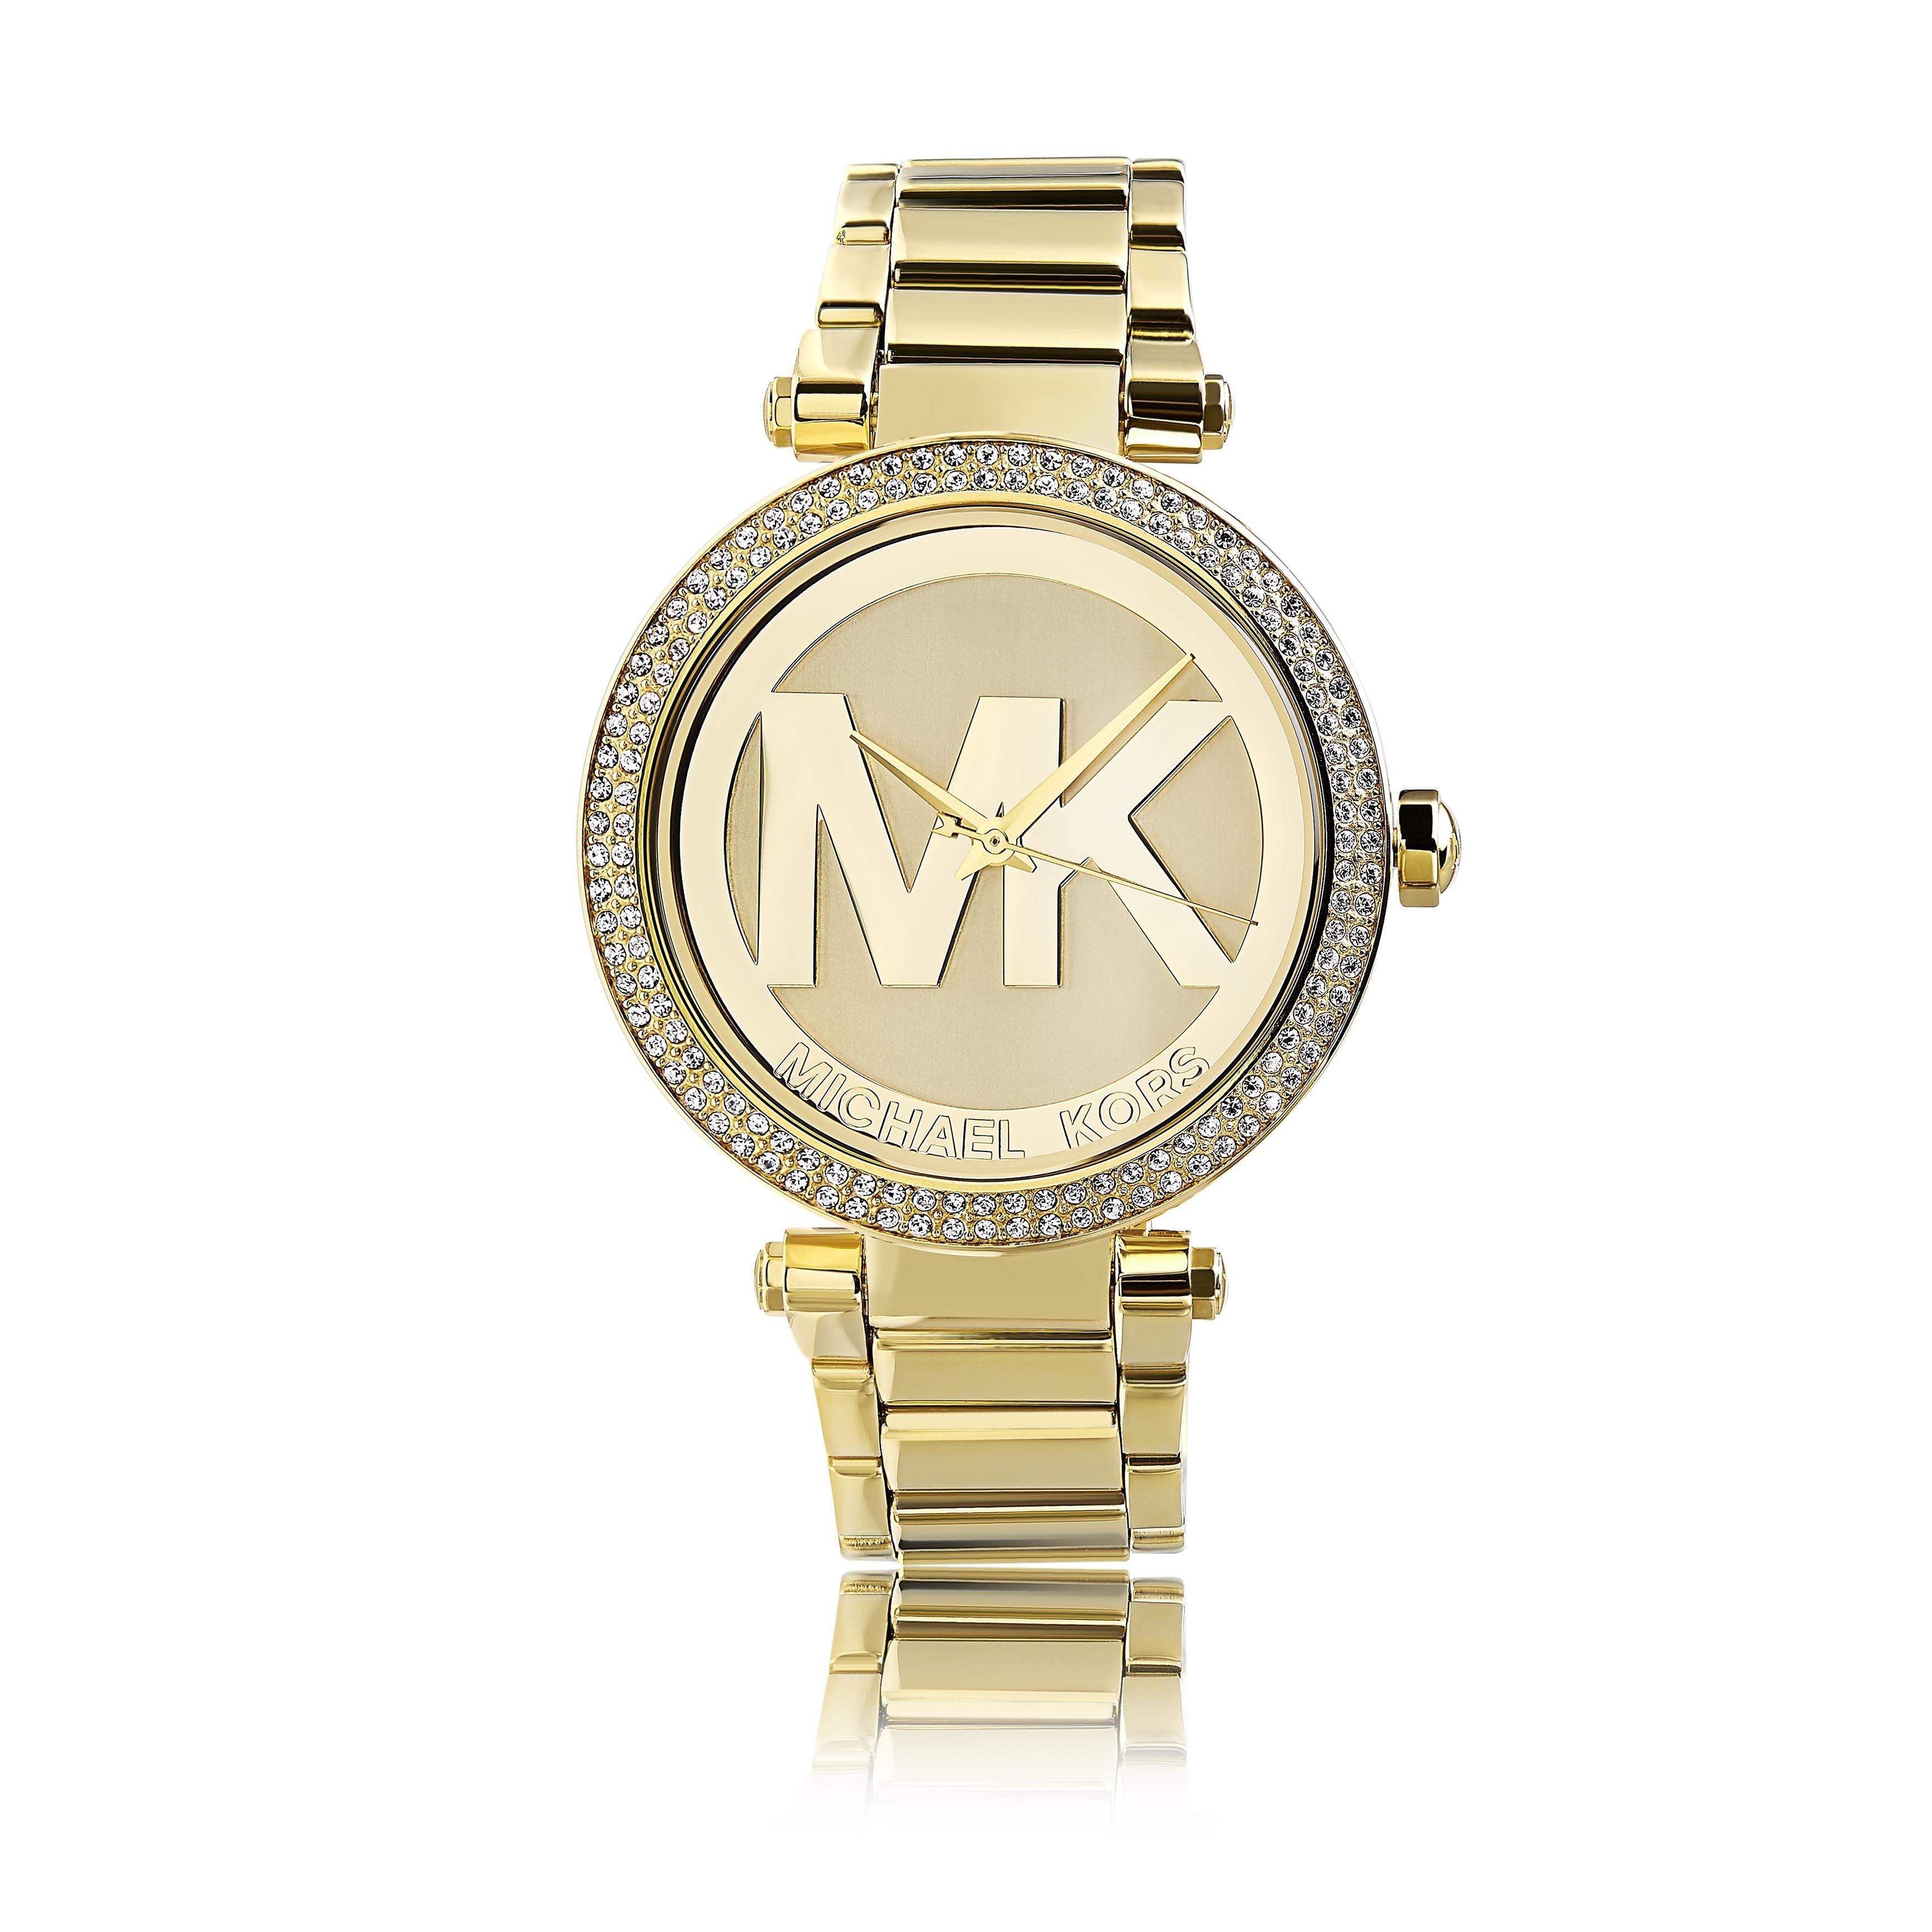 Michael Kors Women's MK5784 'Parker' Goldtone Crystal Accent Watch Gold